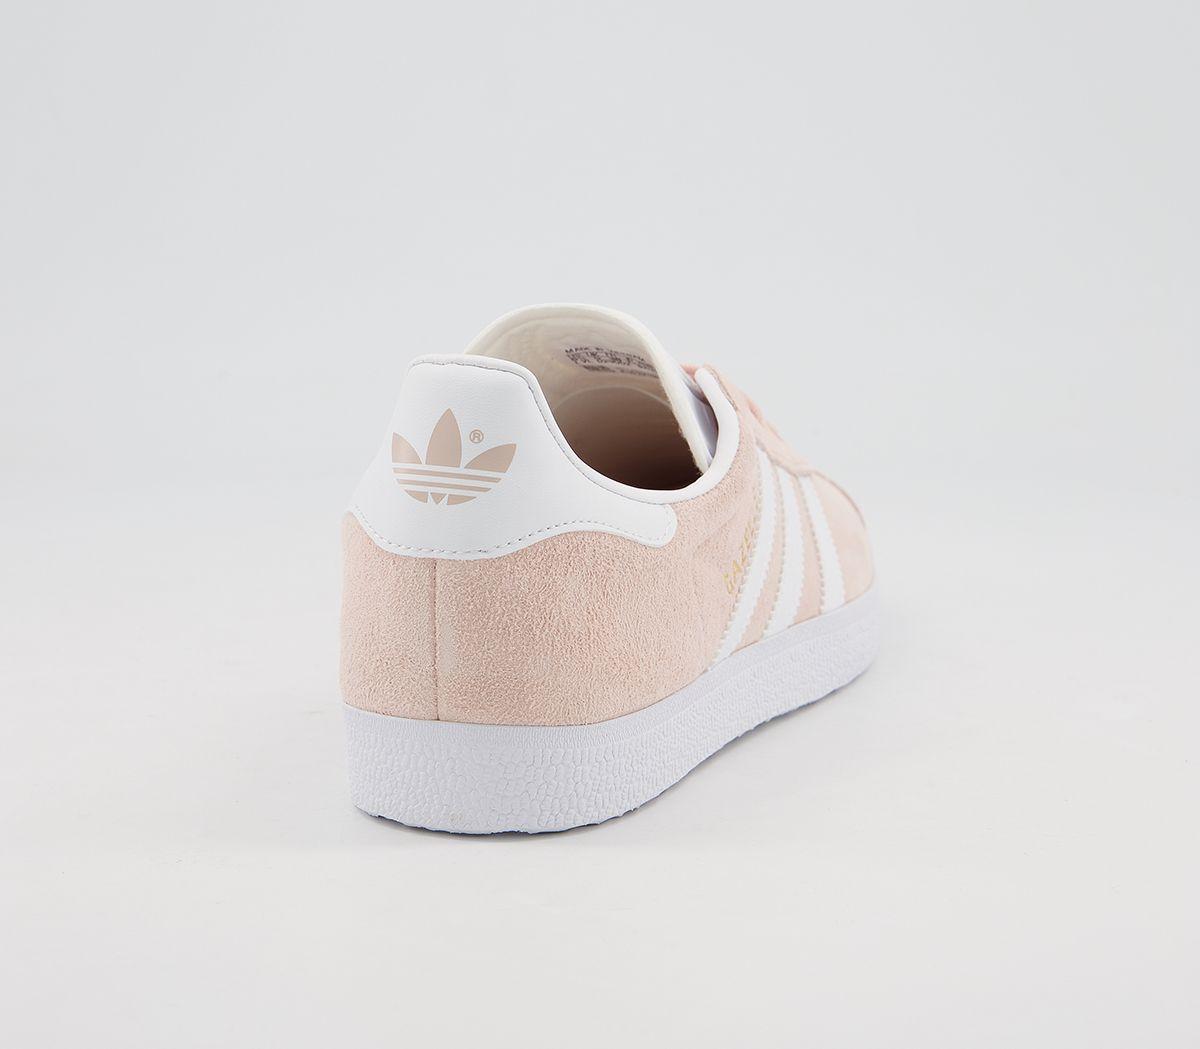 Adidas-Gazelle-Vapour-Pink-White-Trainers-Shoes thumbnail 10